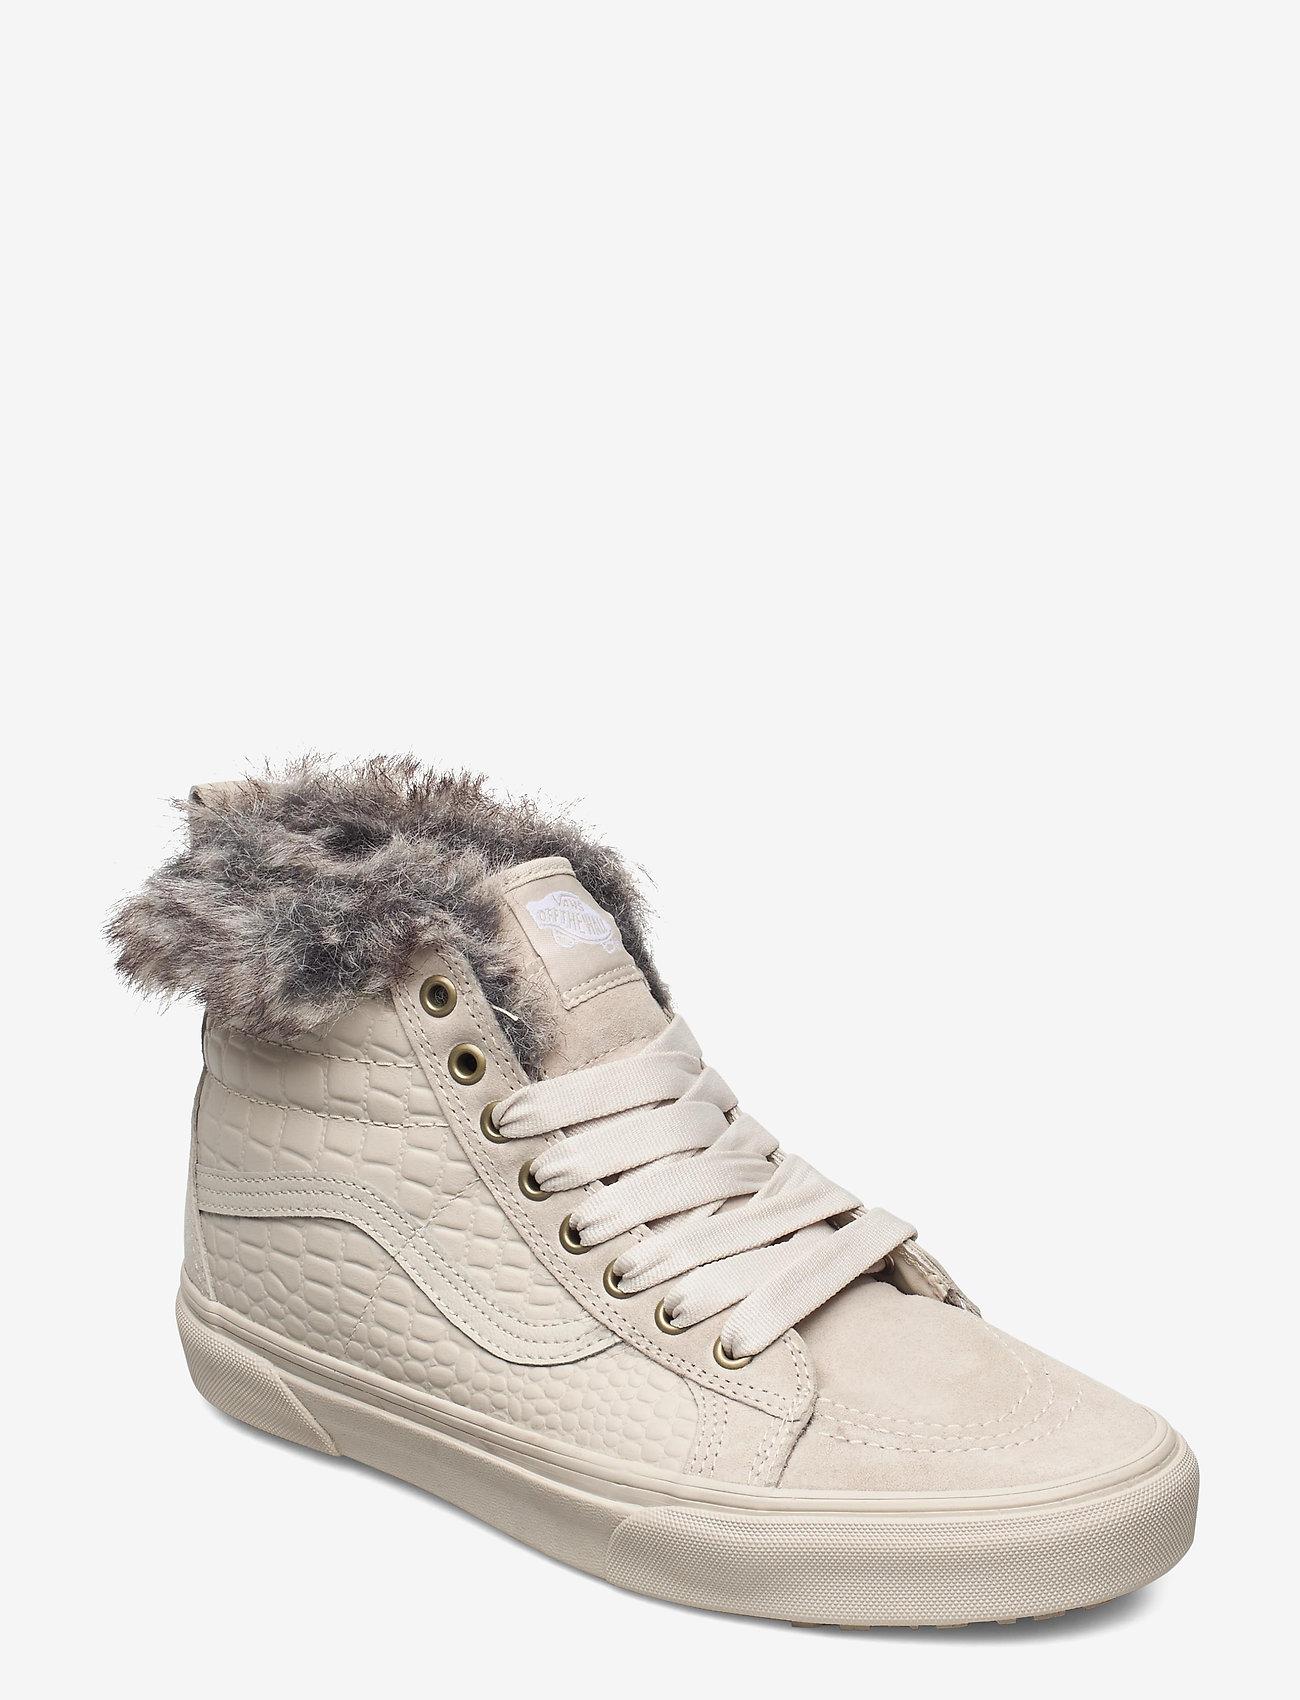 VANS - UA SK8-Hi MTE - hoge sneakers - (croc mte)oatmeal/oatmeal - 0